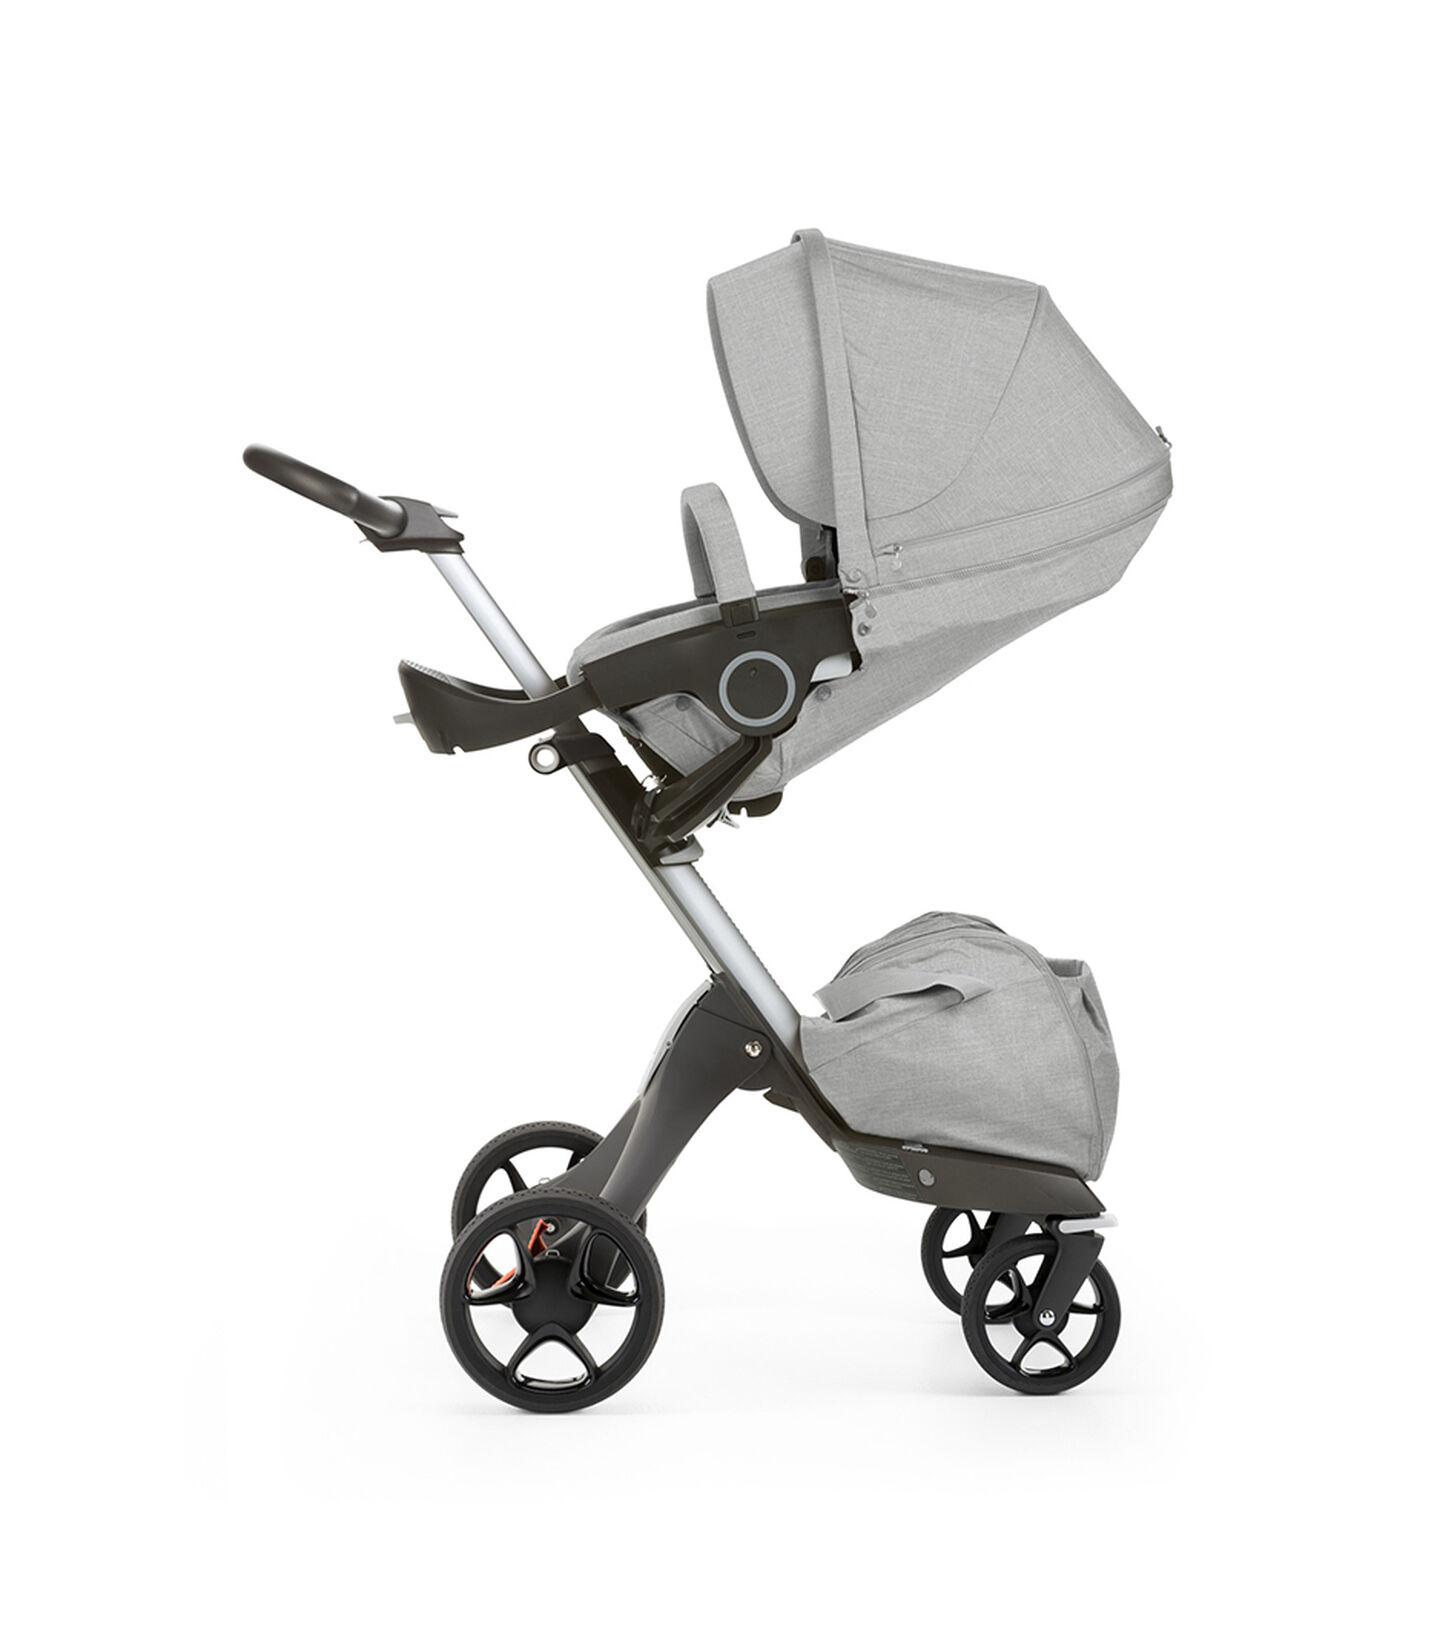 Stokke® Xplory® with Stokke® Stroller Seat, parent facing, sleep position. Grey Melange. New wheels 2016. view 1